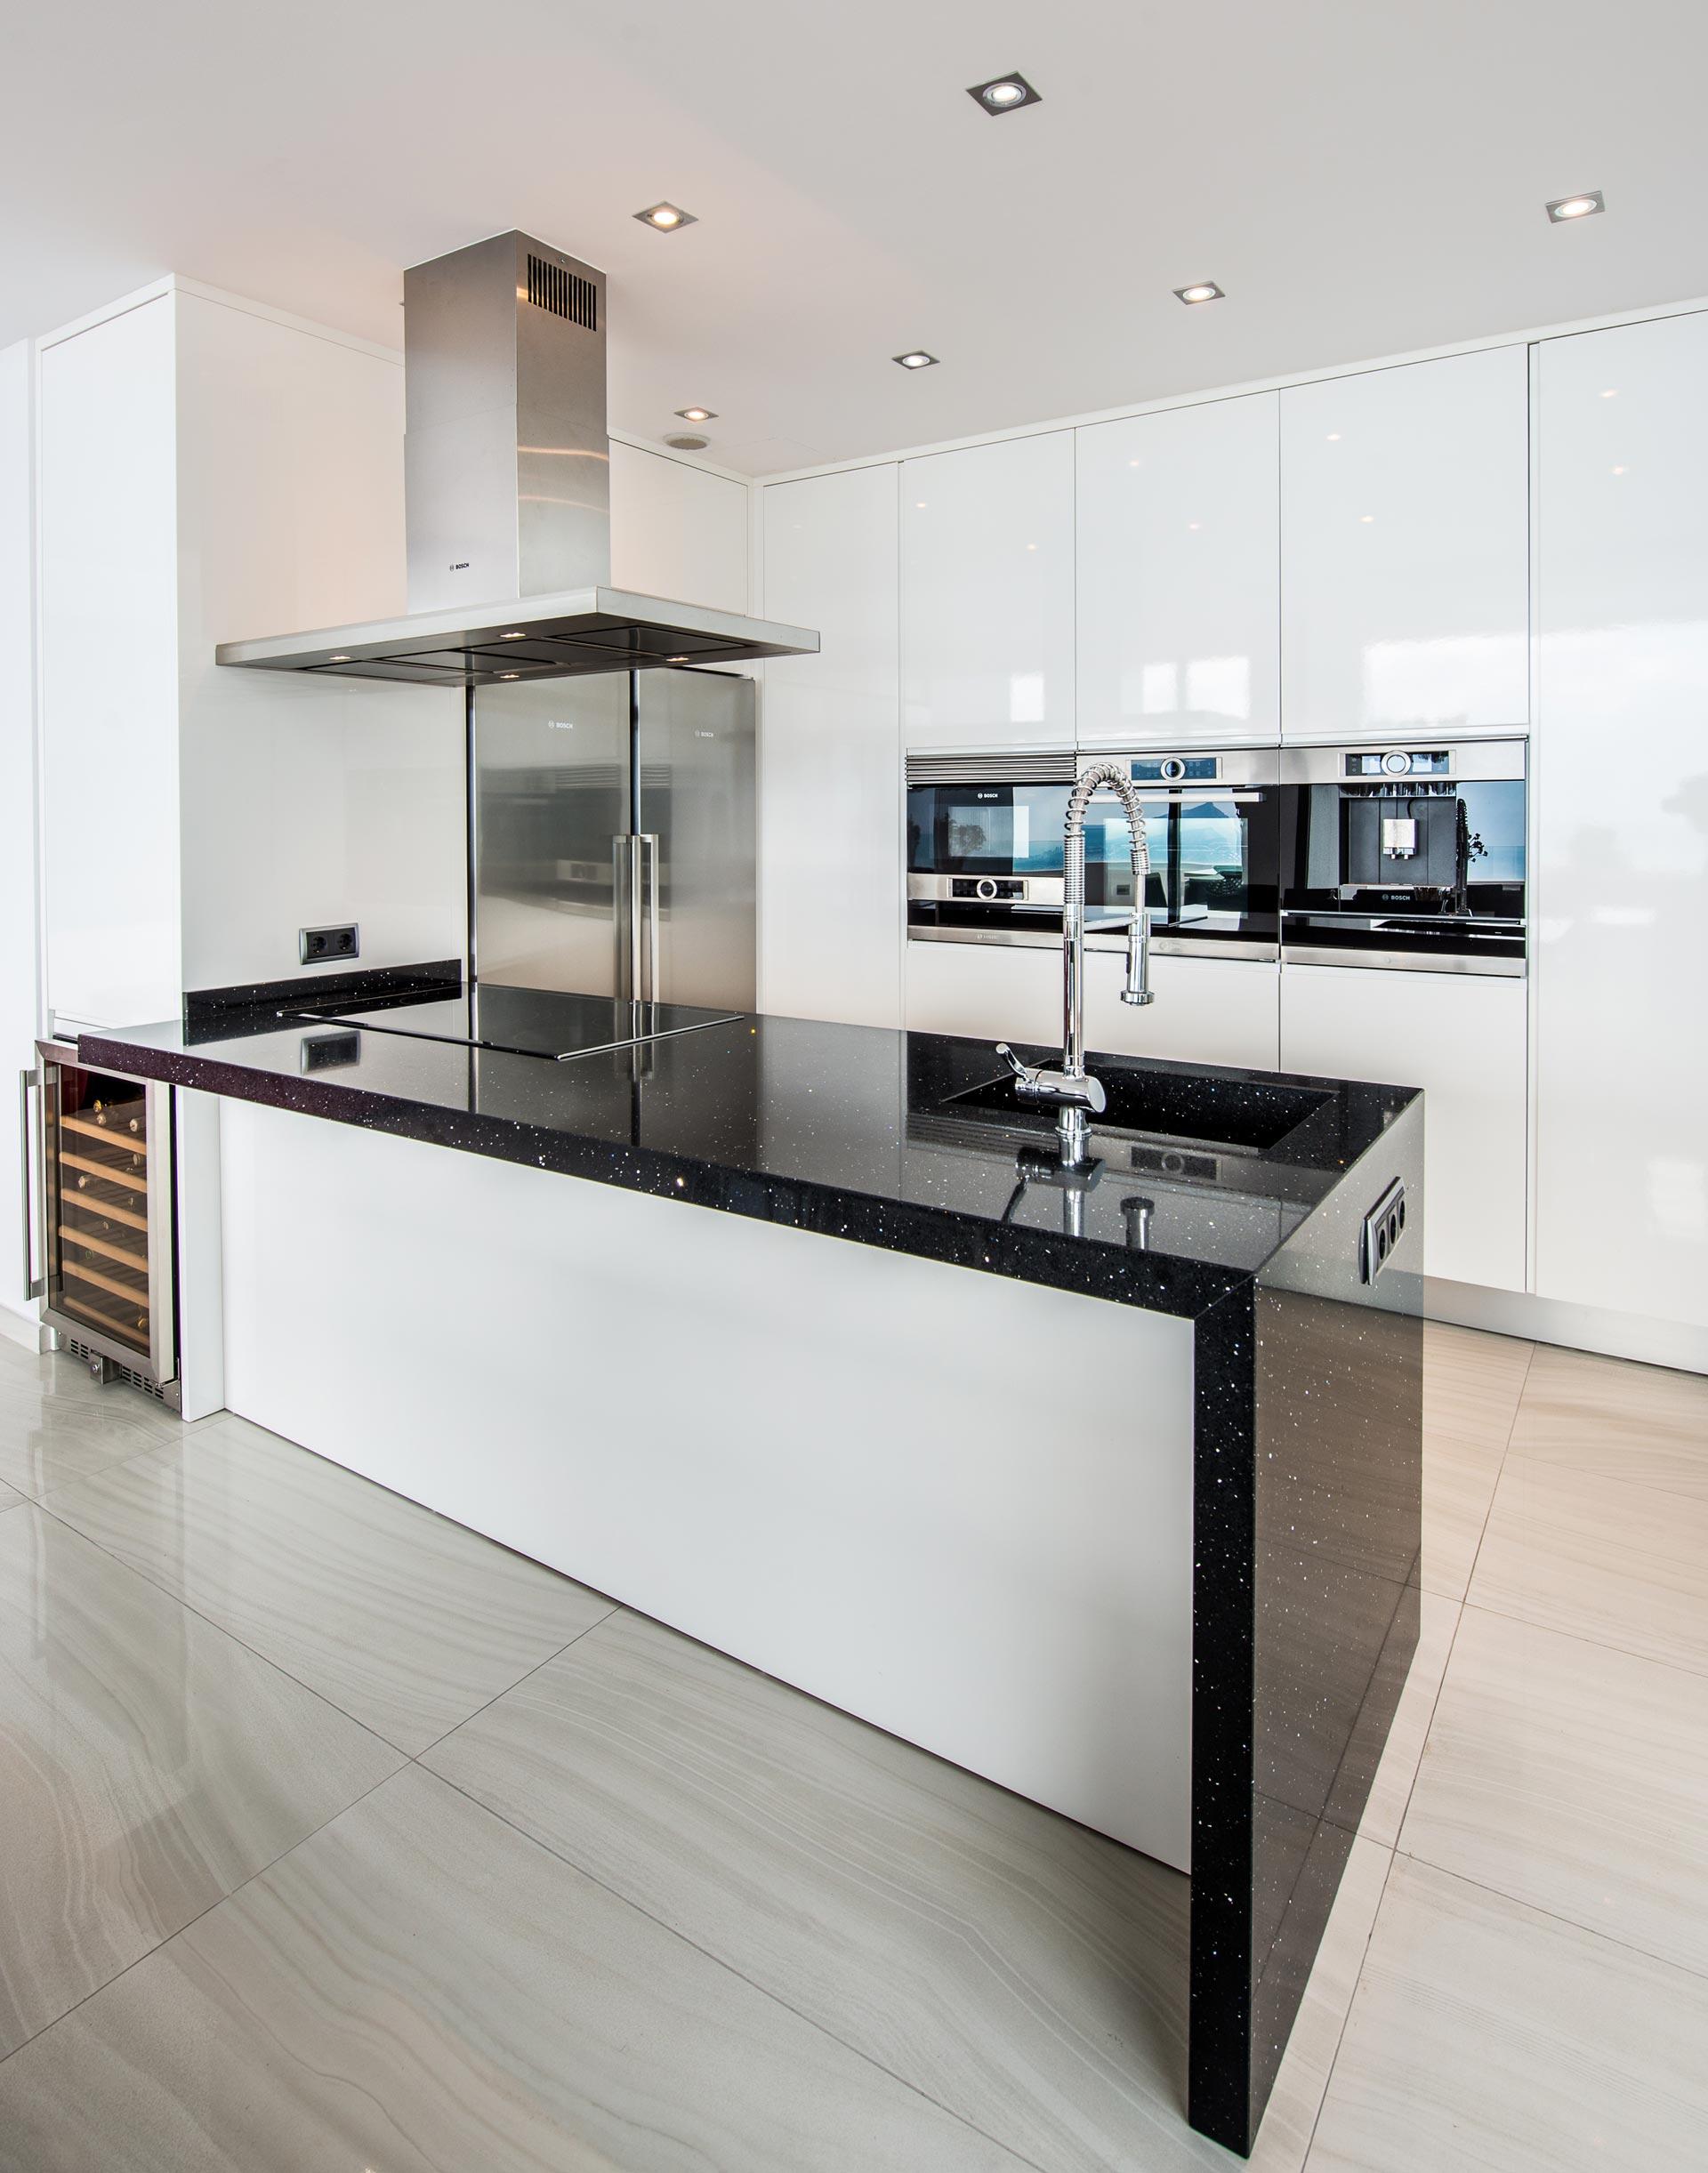 Empresas fabricas fabricantes muebles mobiliario cocinas a medida valencia castellon alicante 1 - Muebles de valencia fabricantes ...